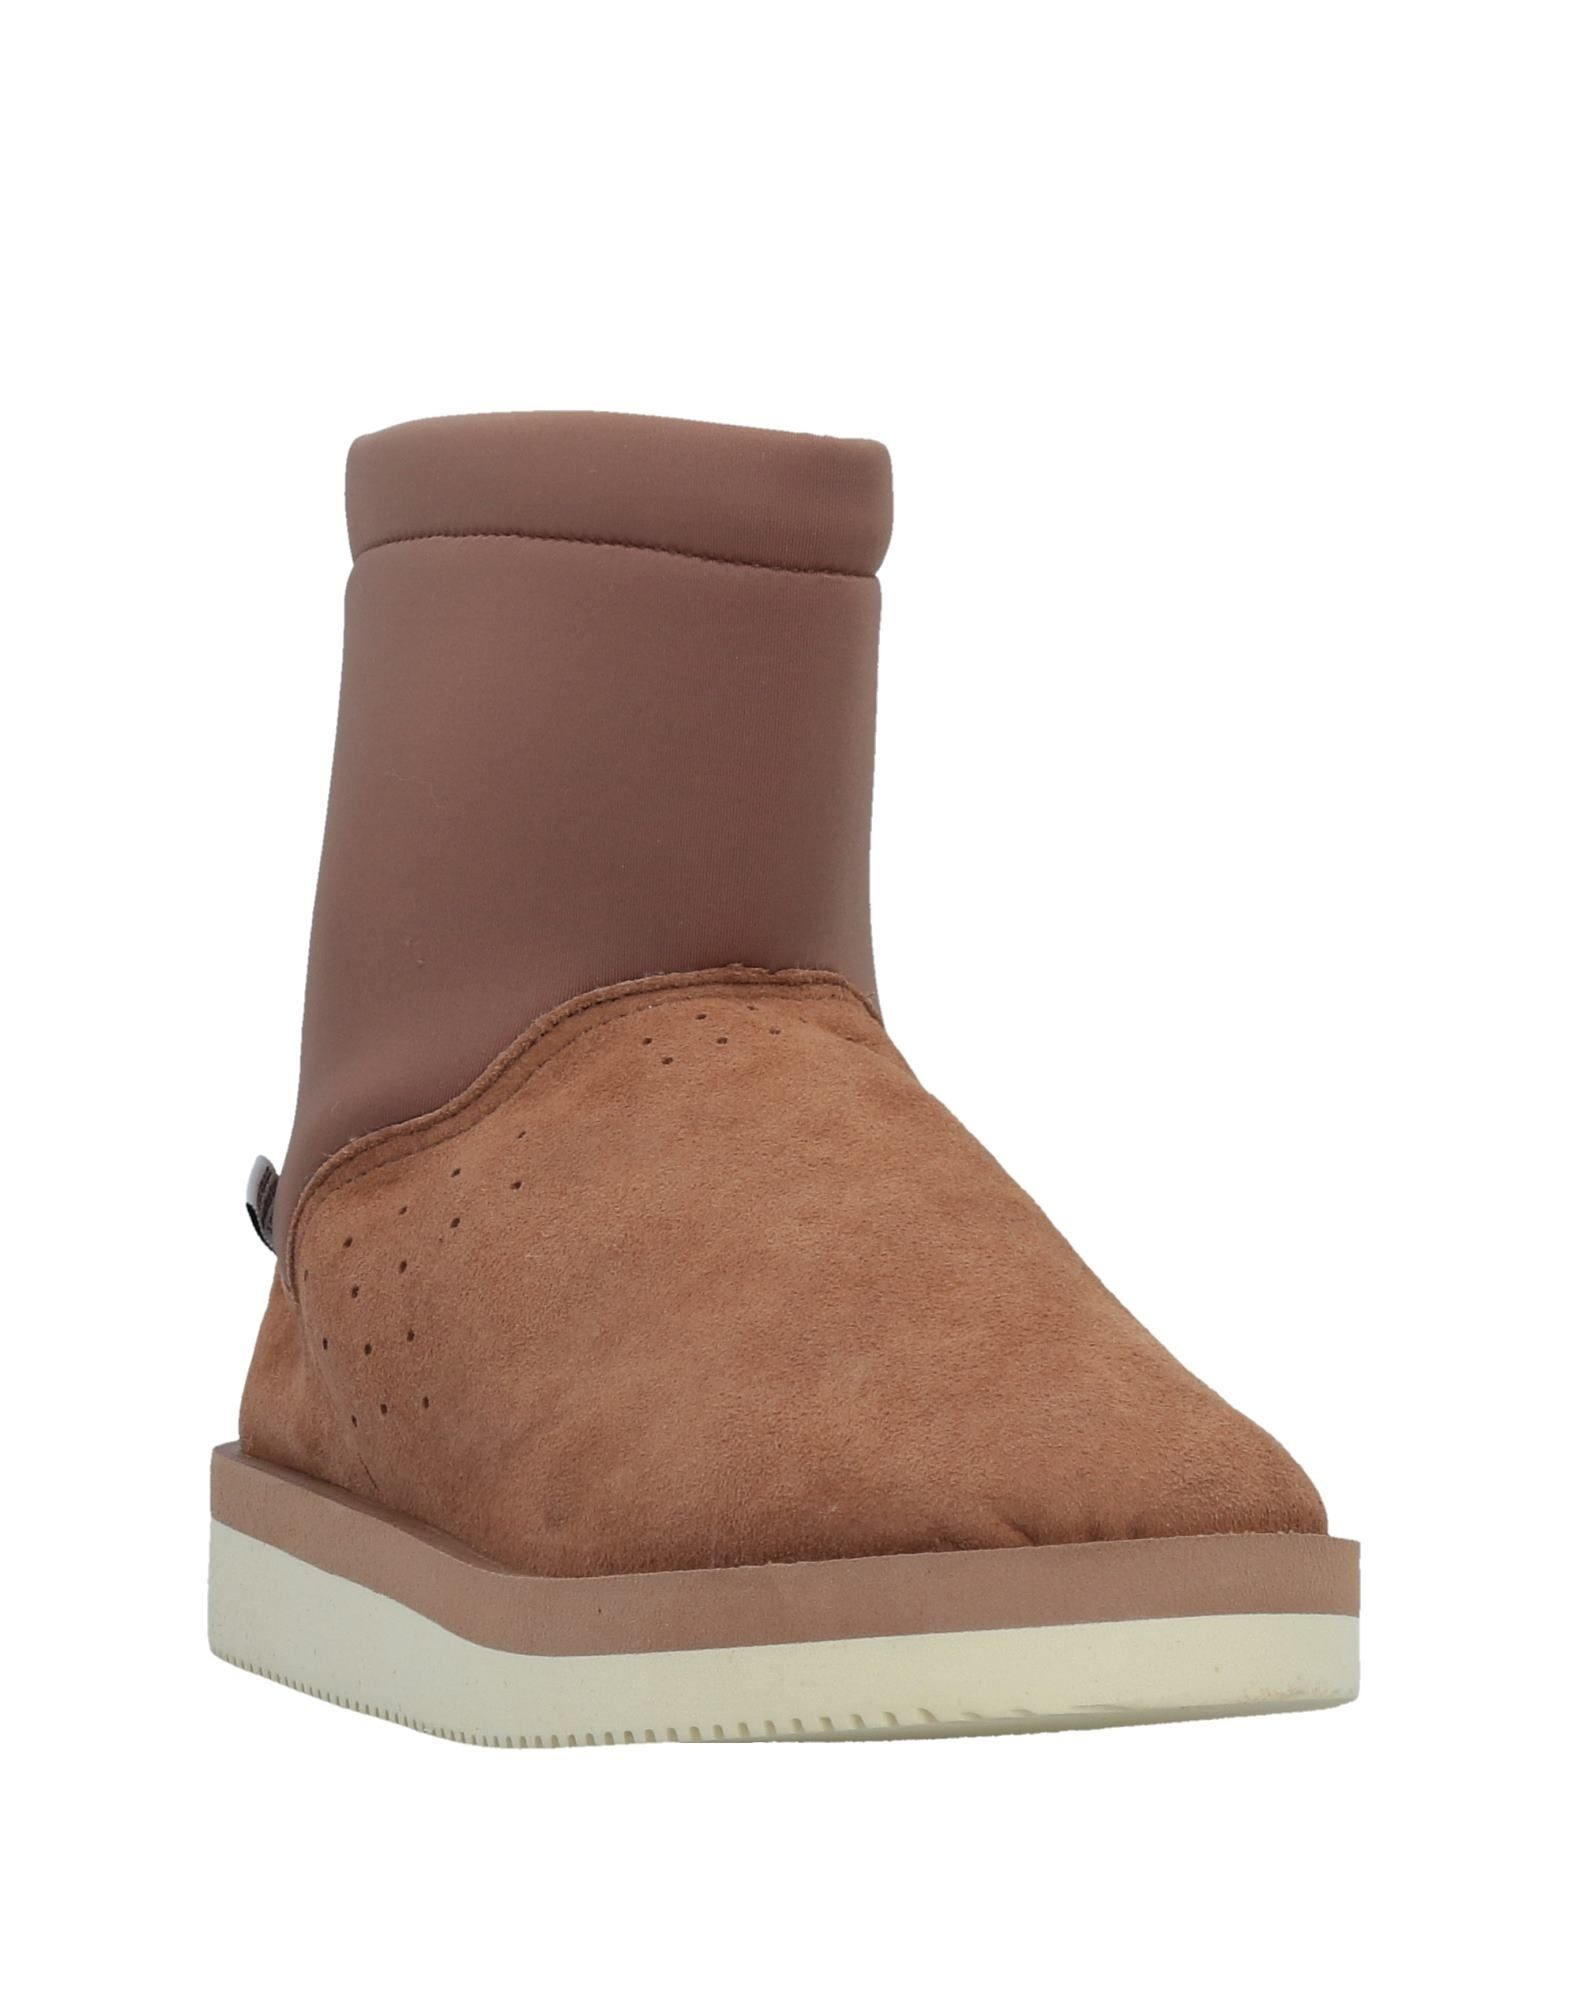 Stilvolle billige Schuhe 11508199PH Suicoke Stiefelette Damen  11508199PH Schuhe 93a0ec